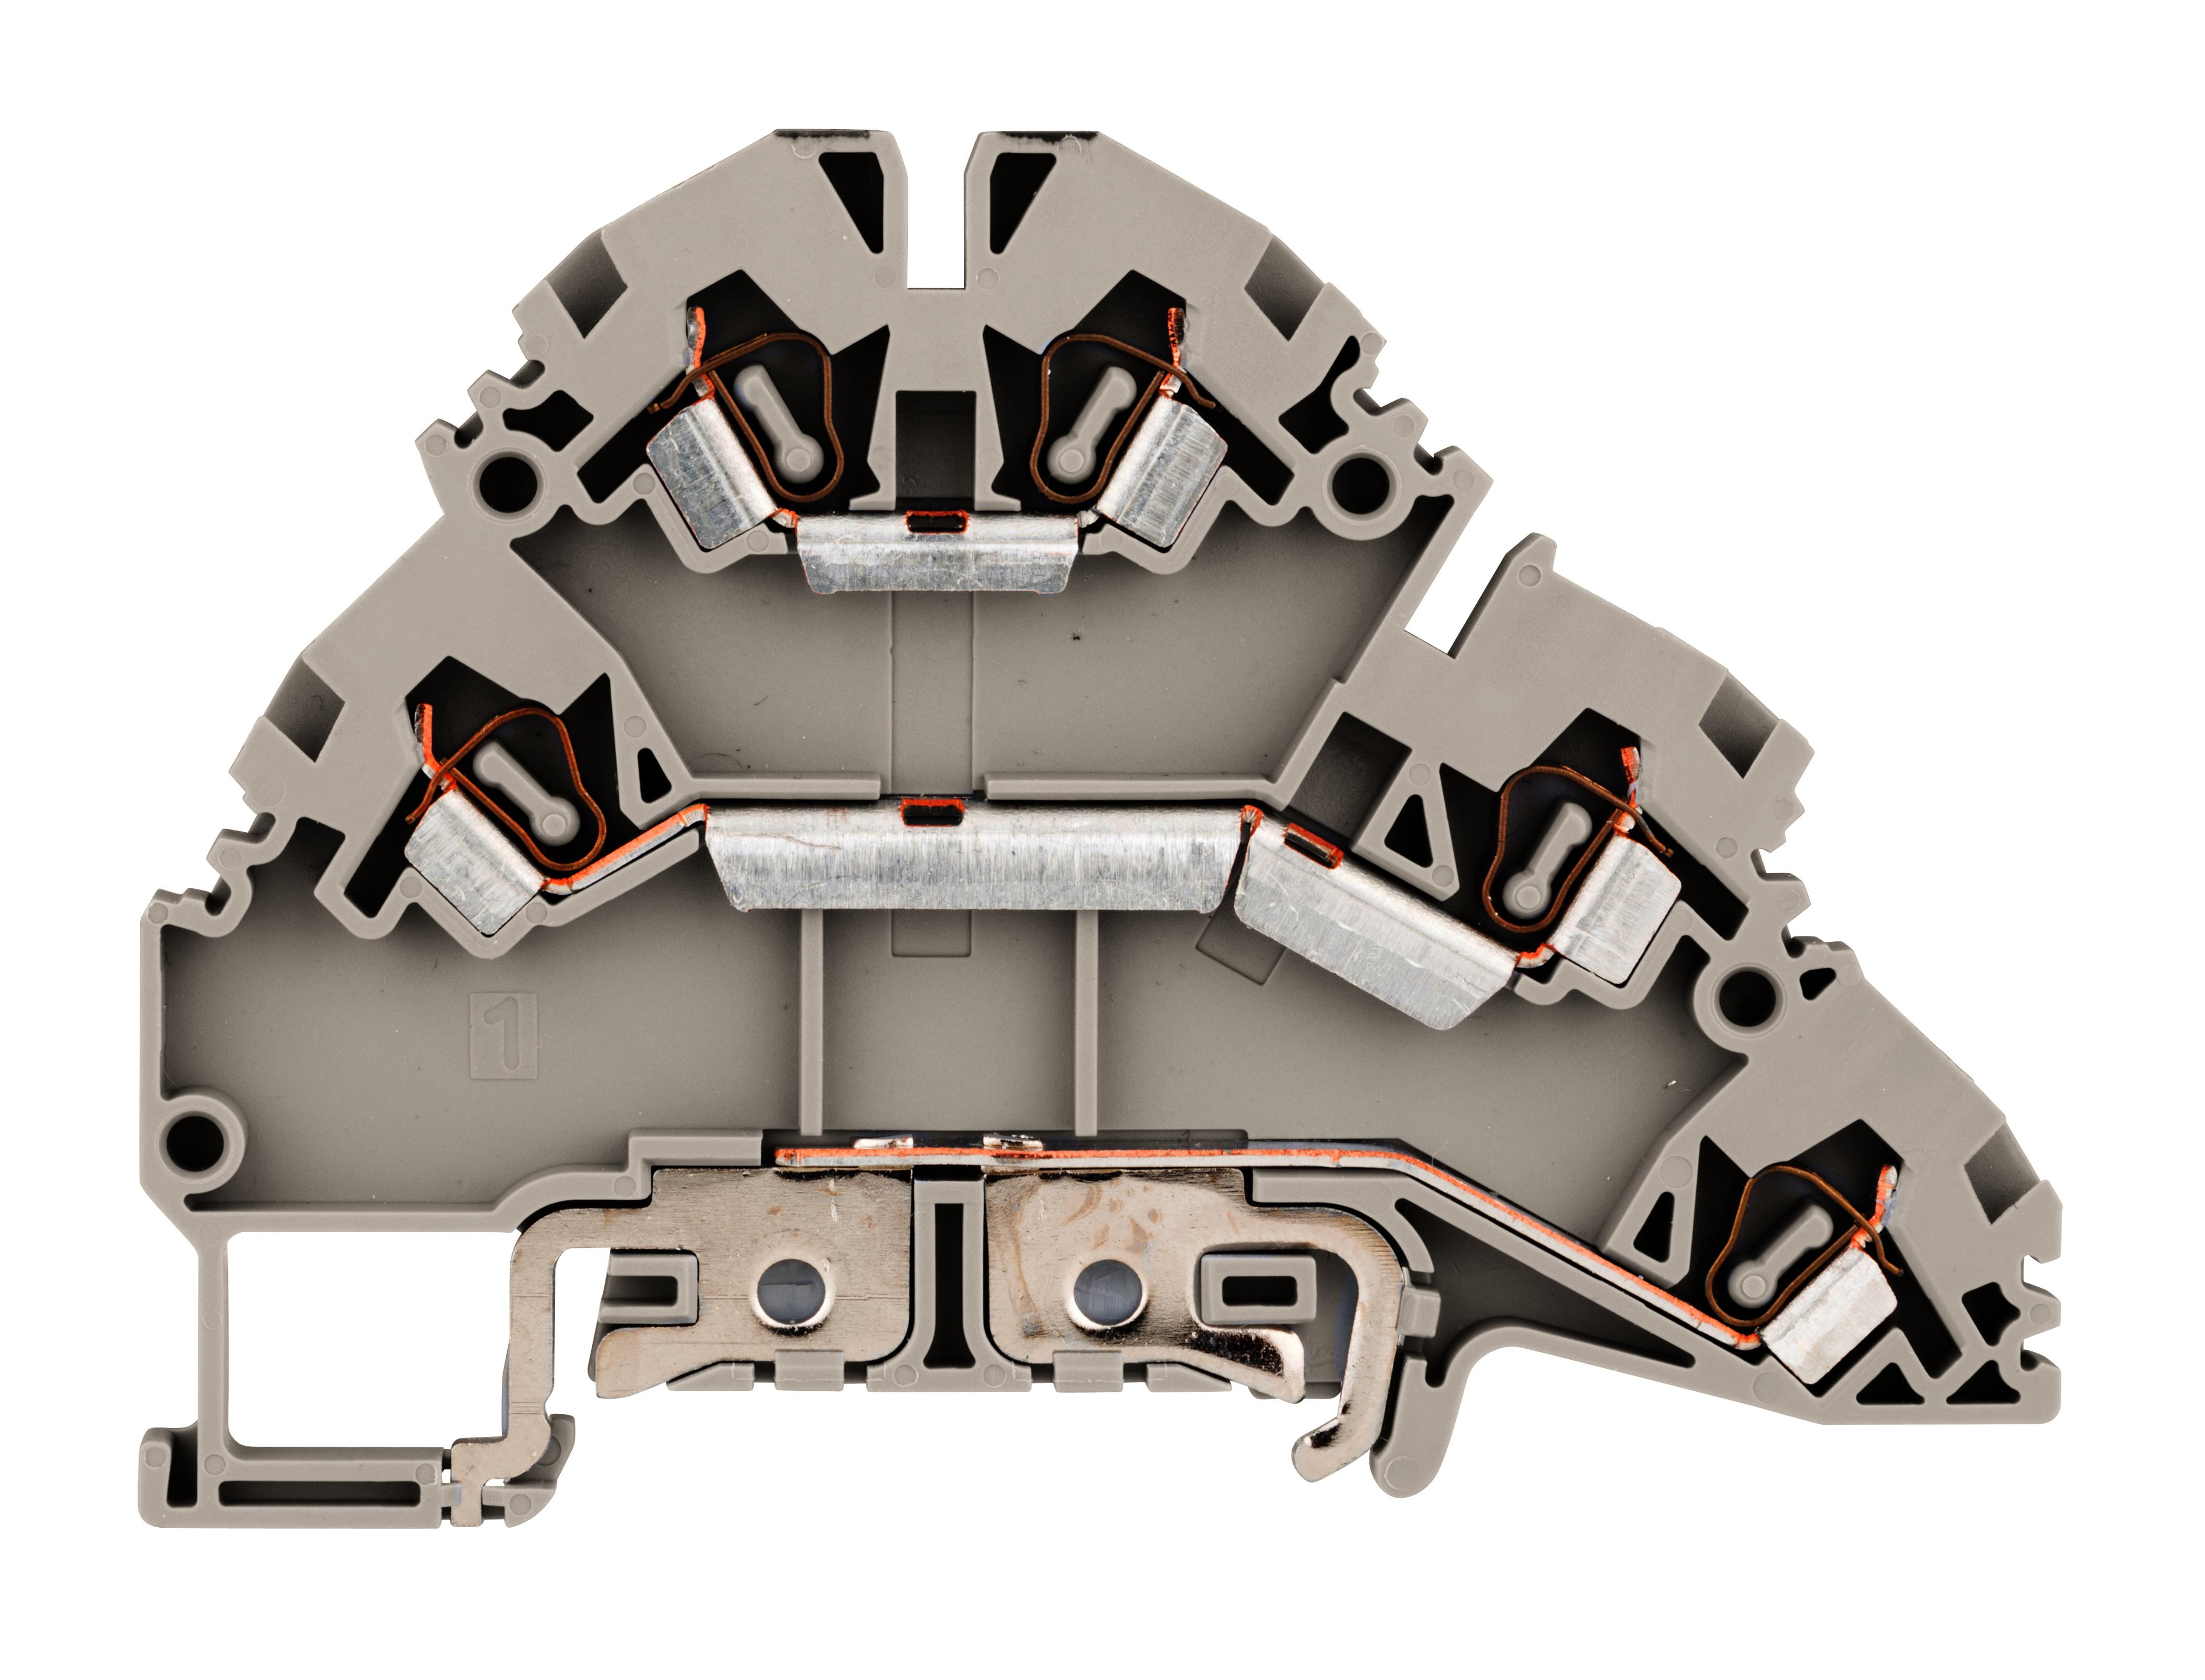 1 Stk Federkraft-Dreistockklemme 2,5mm², Type YBK 2,5 2FT, L/N/PE IK690002--